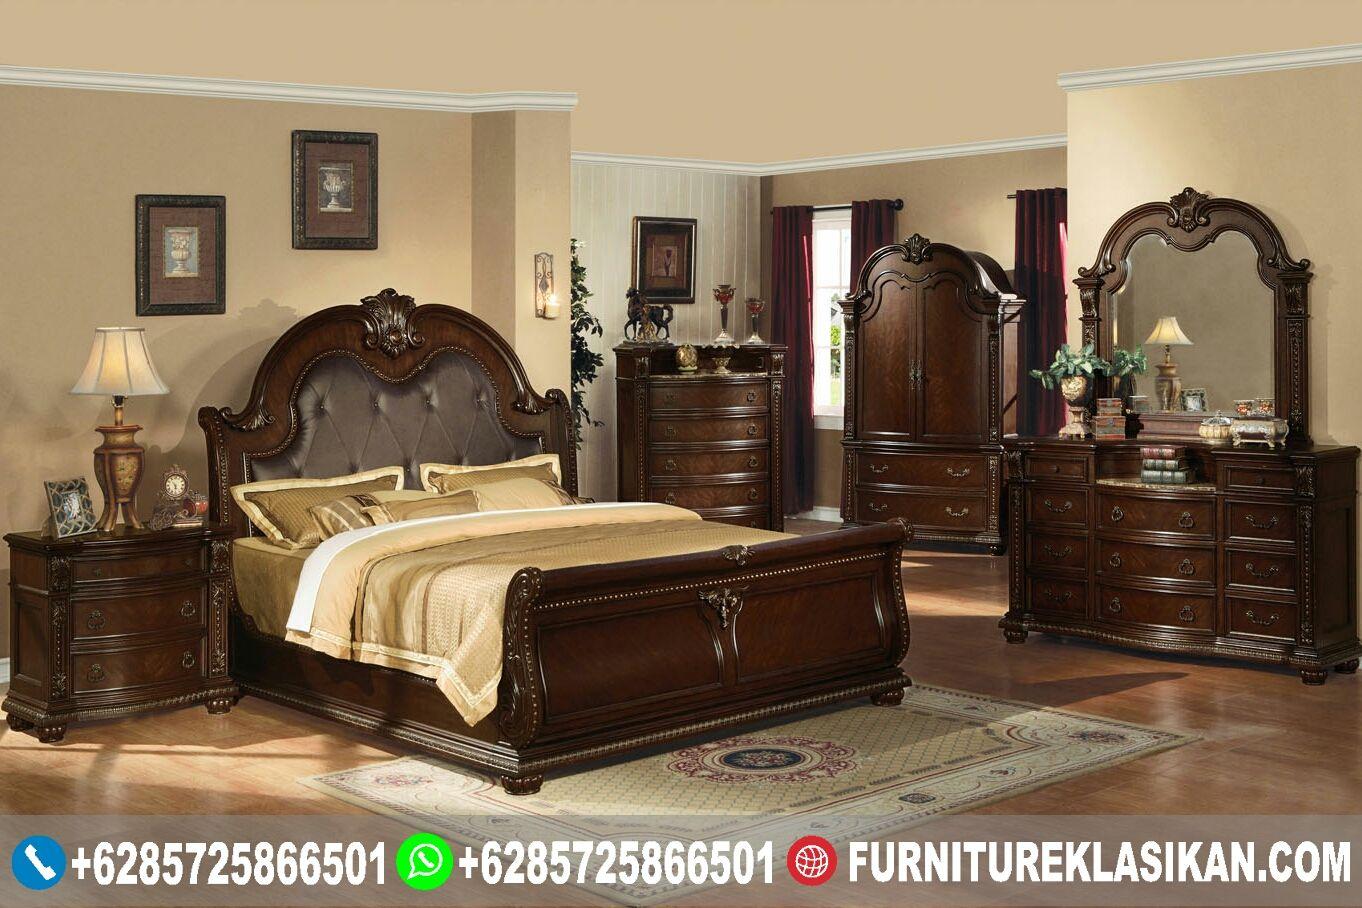 Interior Kamar Tidur Artis | Interior Rumah